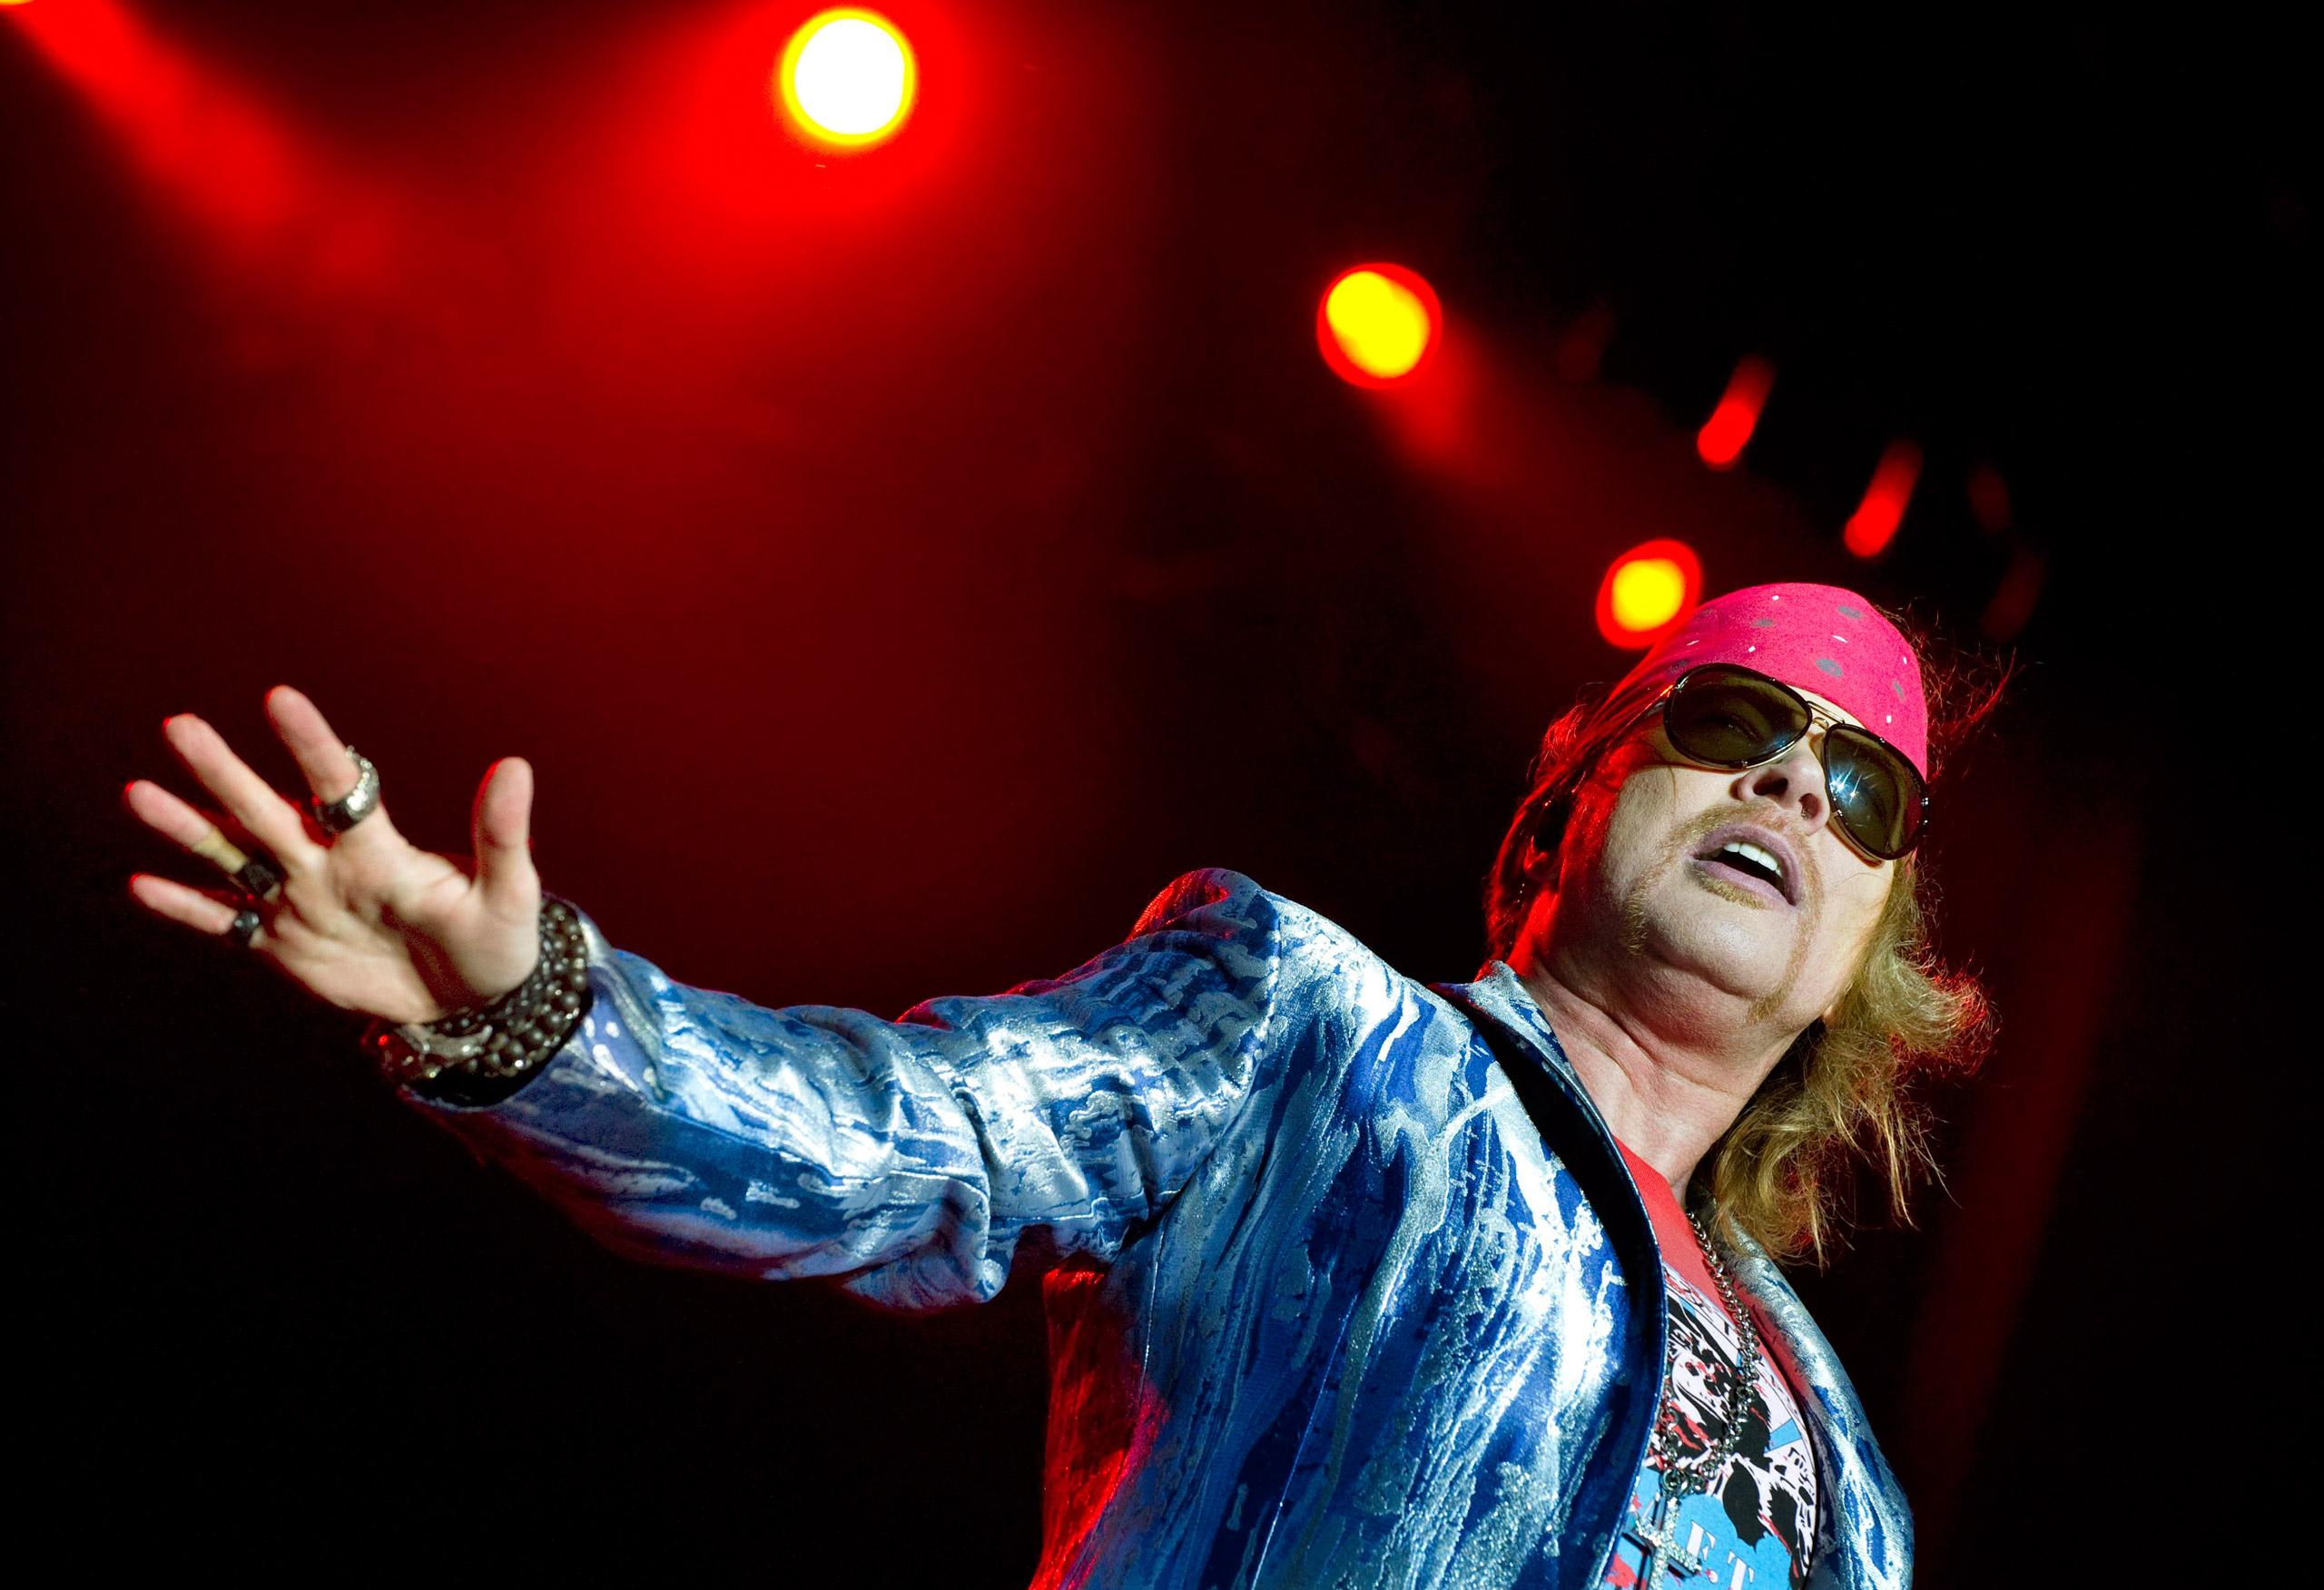 Axl Rose of Guns N' Roses performs during the Sweden Rock Festival in Solvesborg, Sweden, on June 12, 2010.